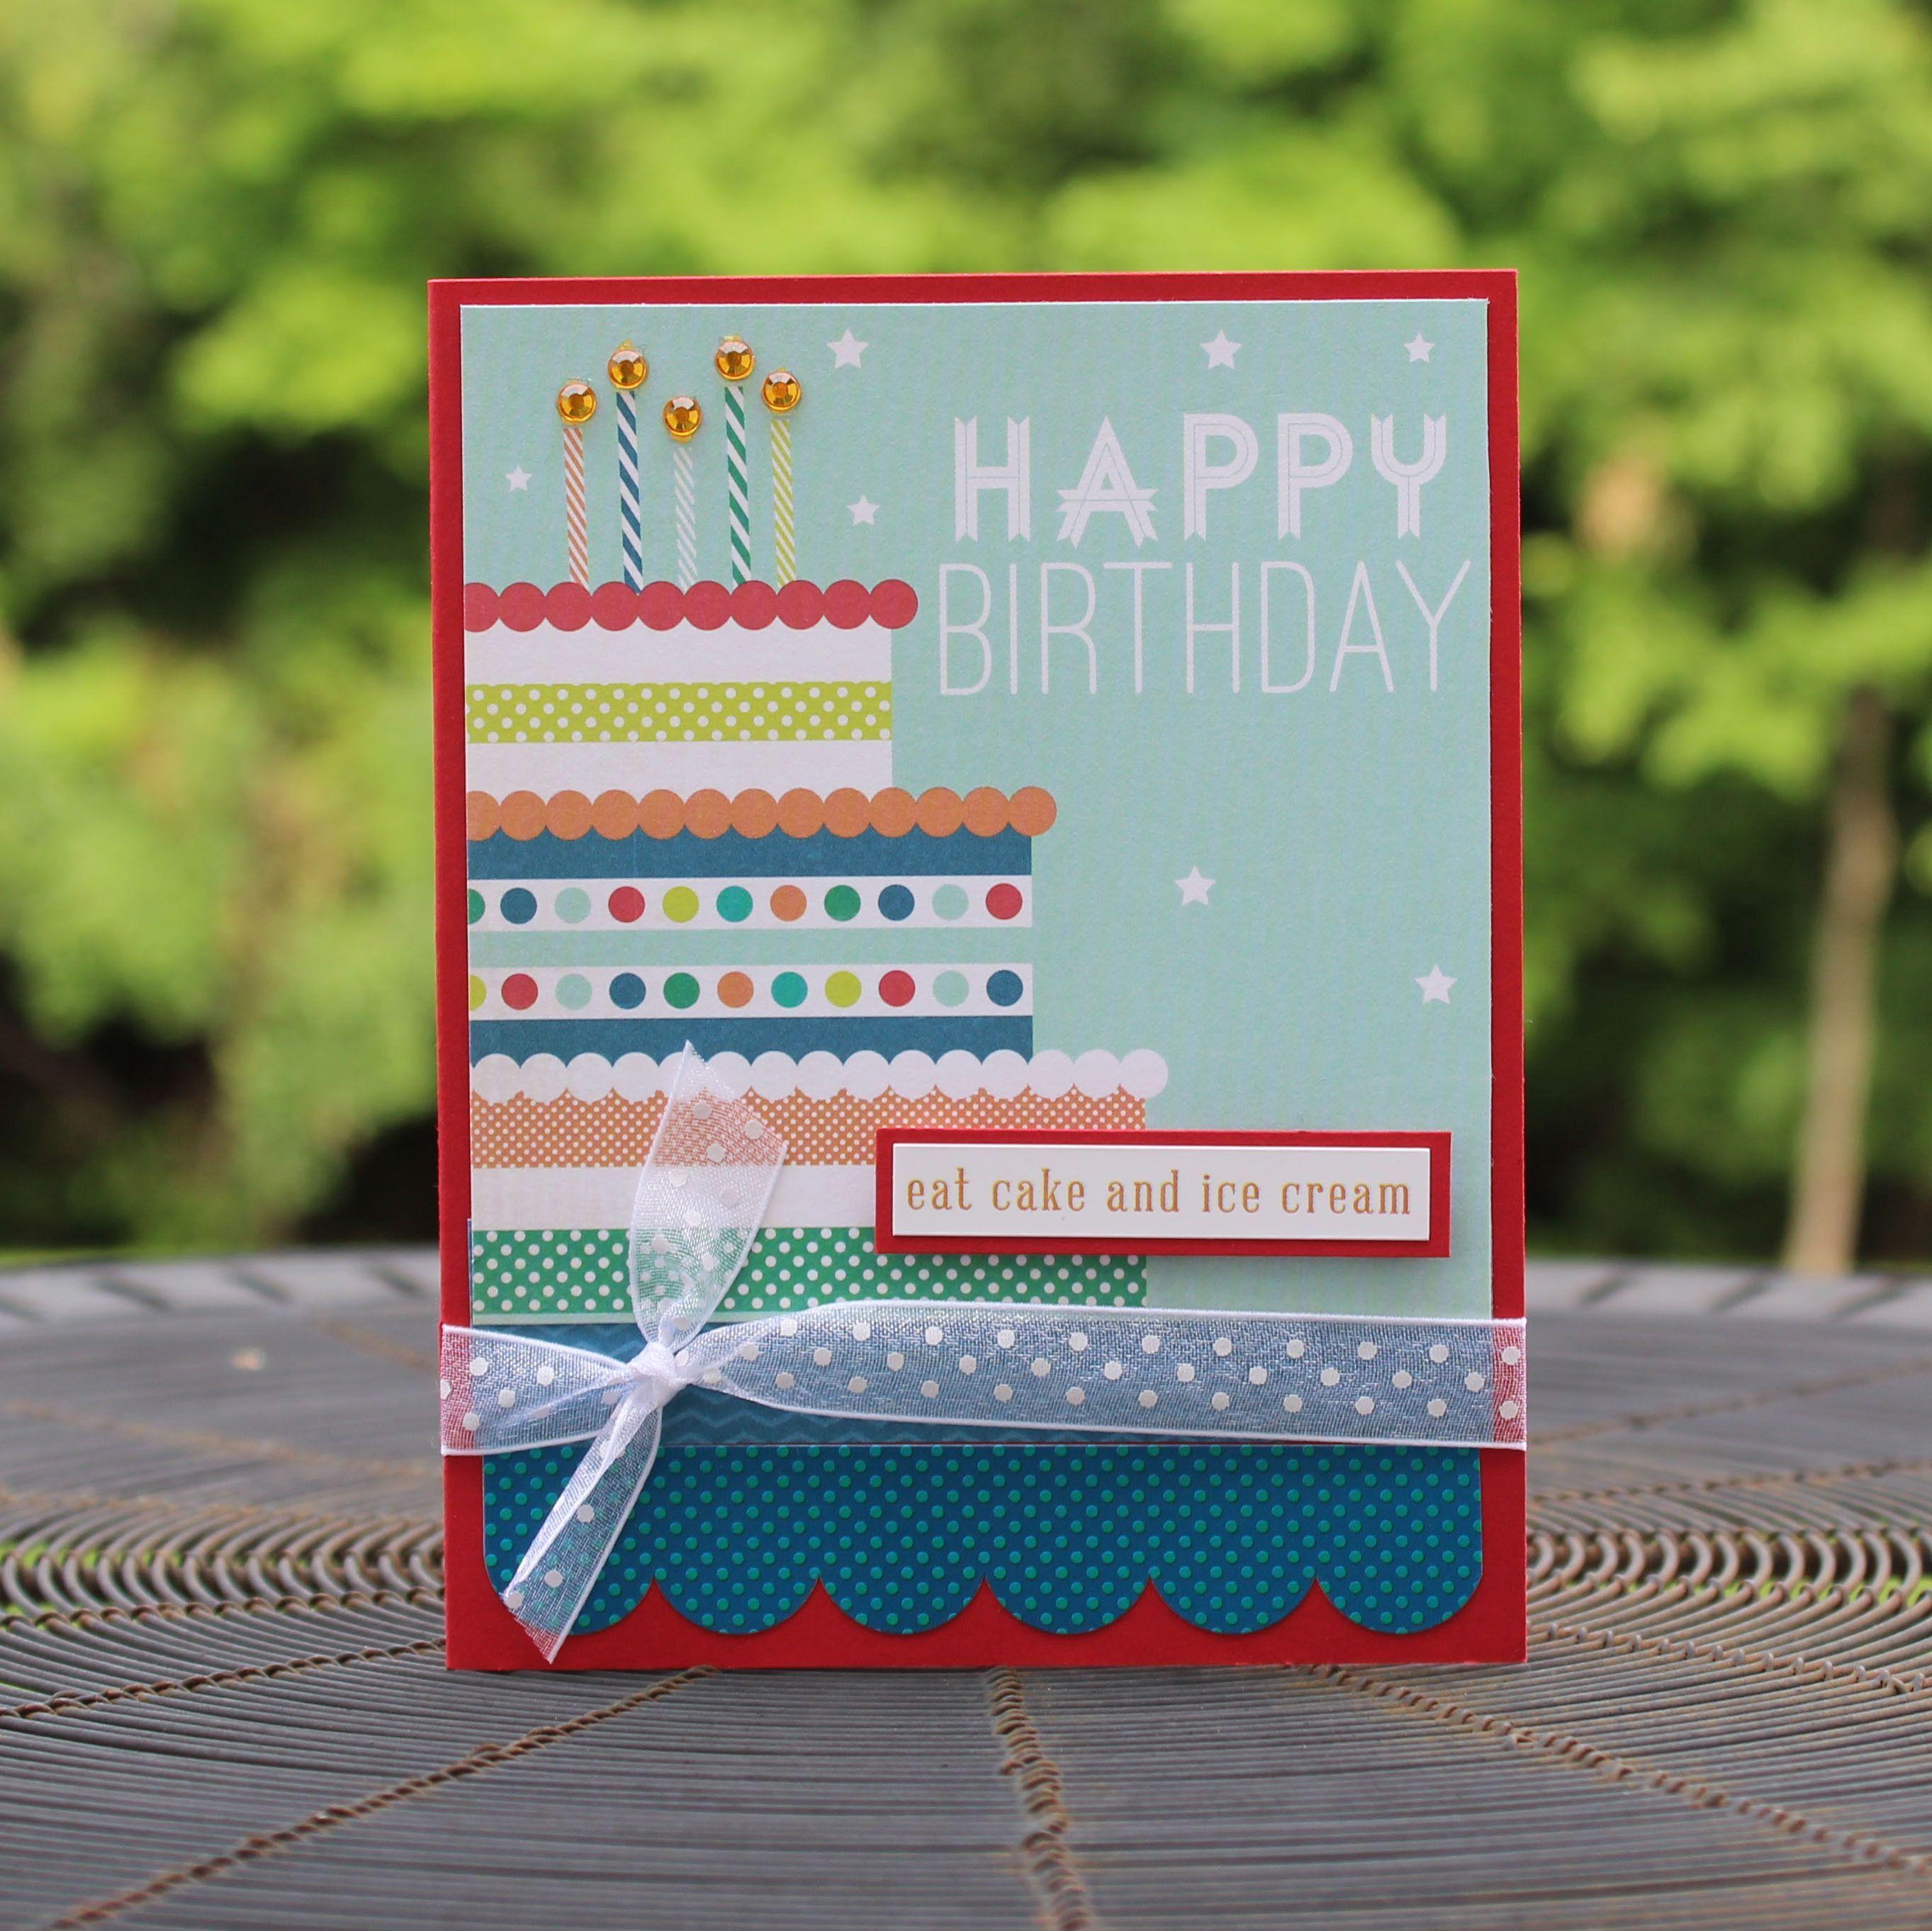 Birthday Cake Happy Birthday Handmade Greeting Card Generic Birthday